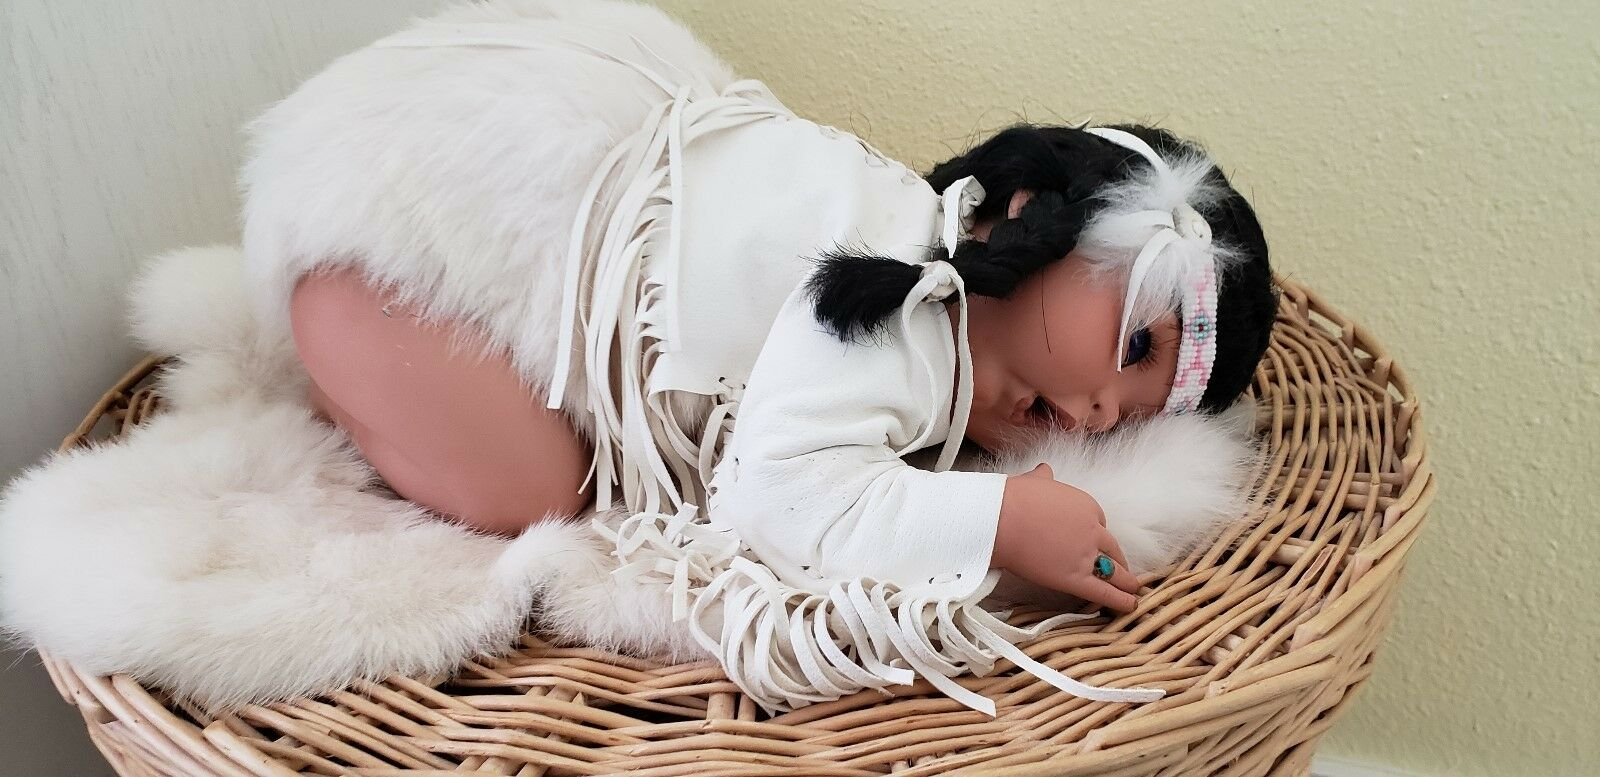 Native American Muñeca De Porcelana Ltd Ed Norma Williamson Kunz  250 Con Cert authen